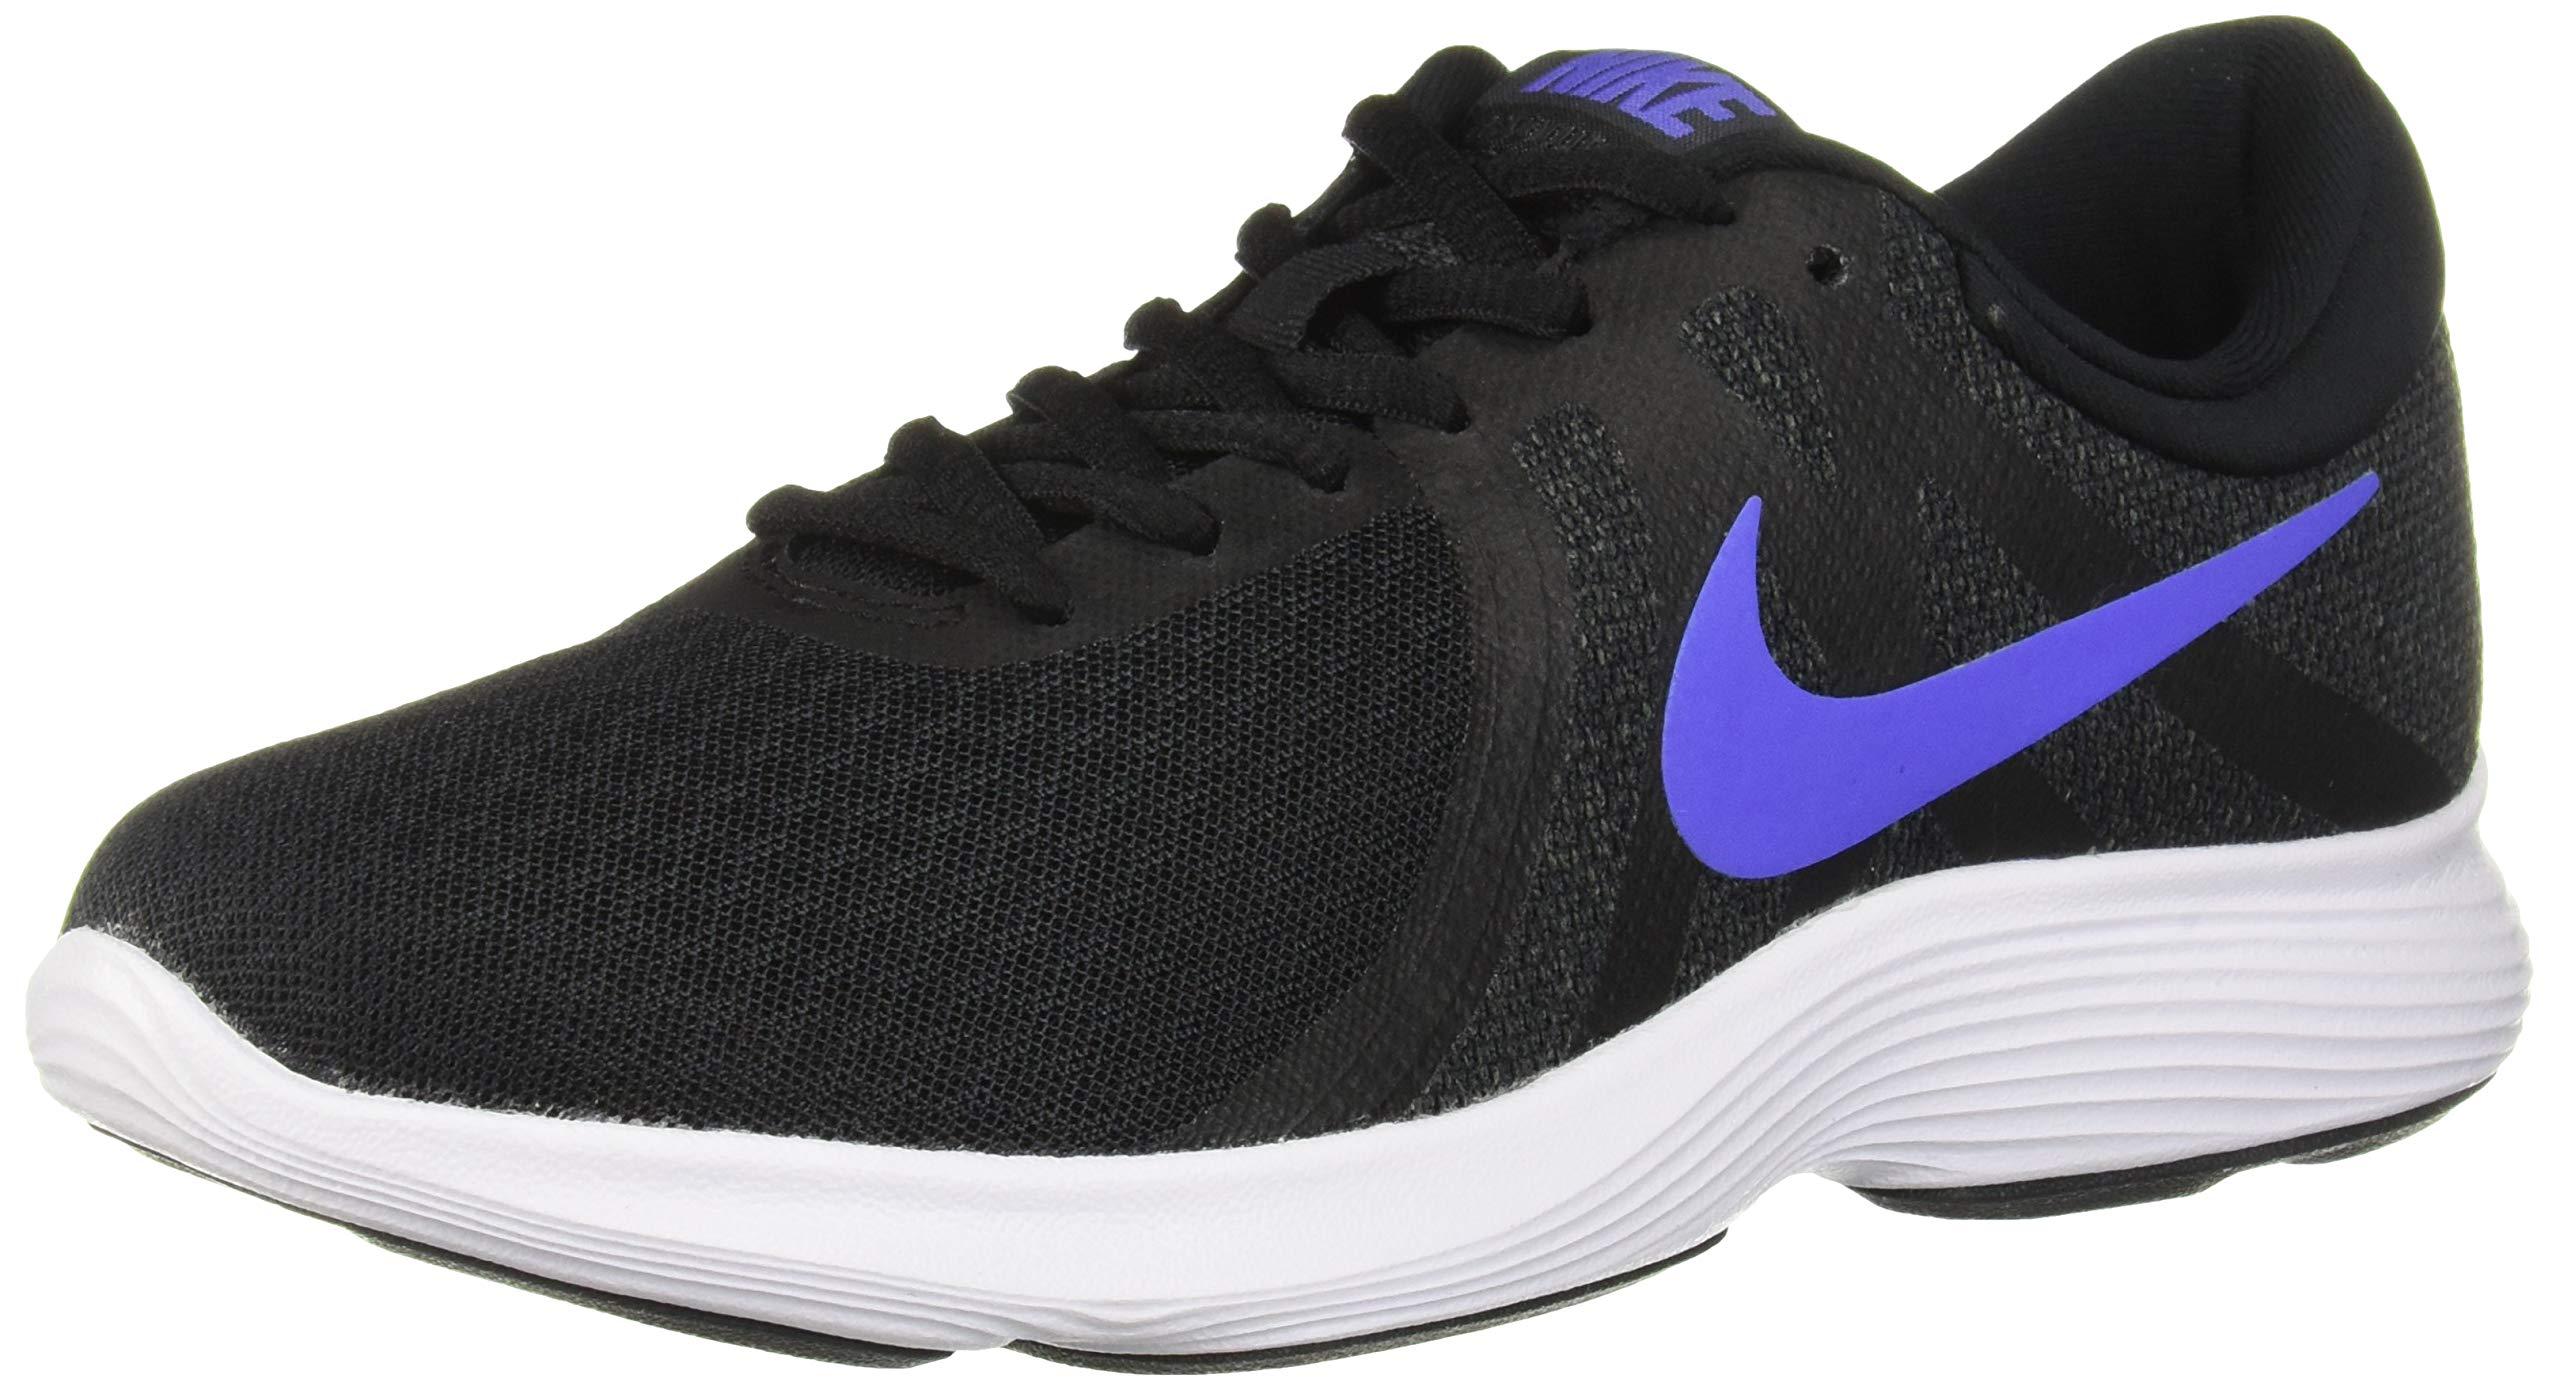 Nike Women's Revolution 4 Running Shoe, Black/Sapphire-Anthracite-White, 5 Regular US